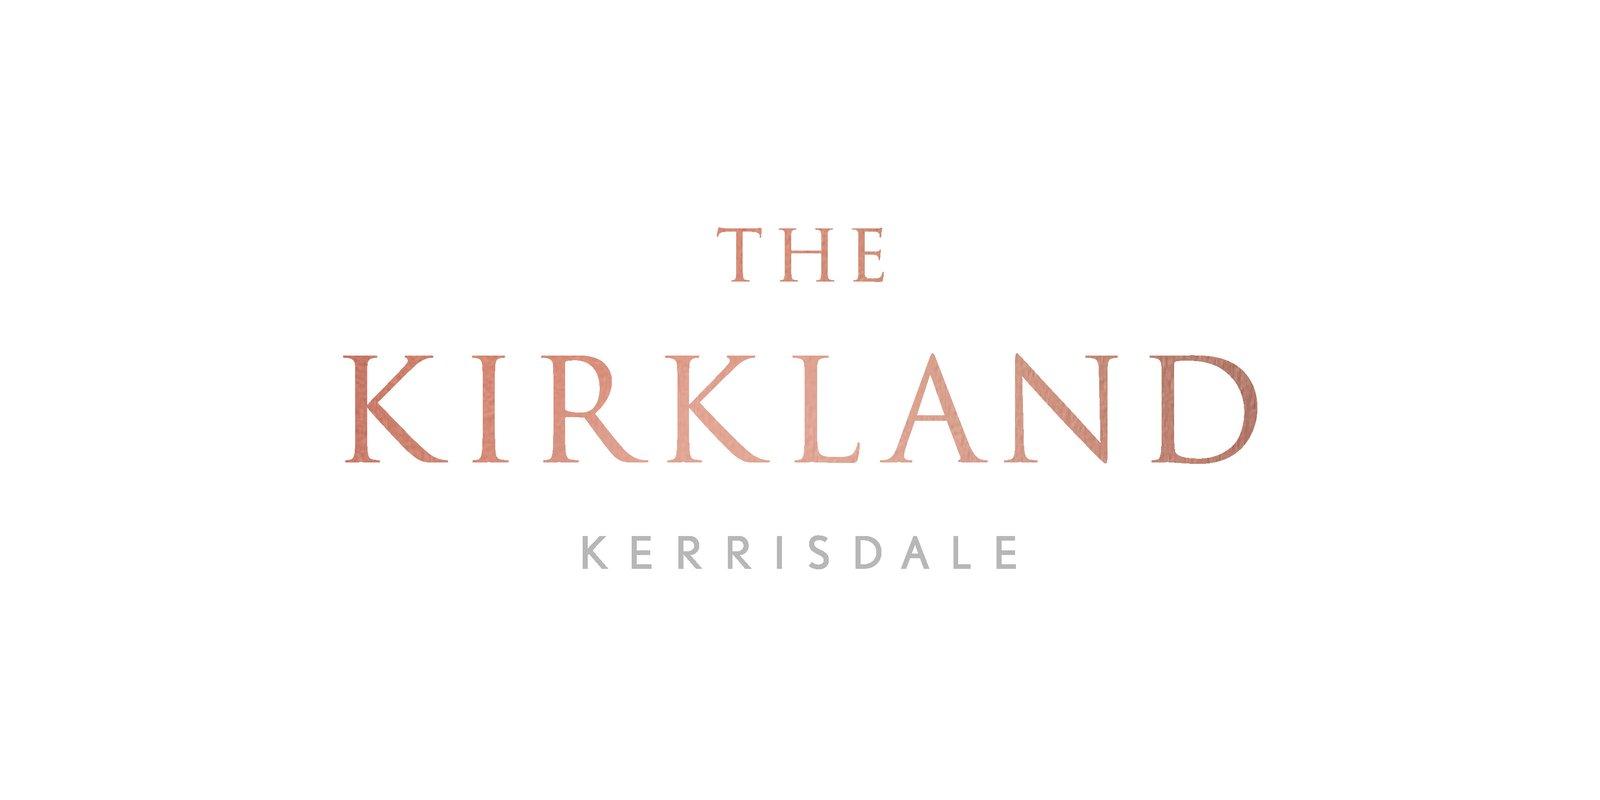 The Kirkland